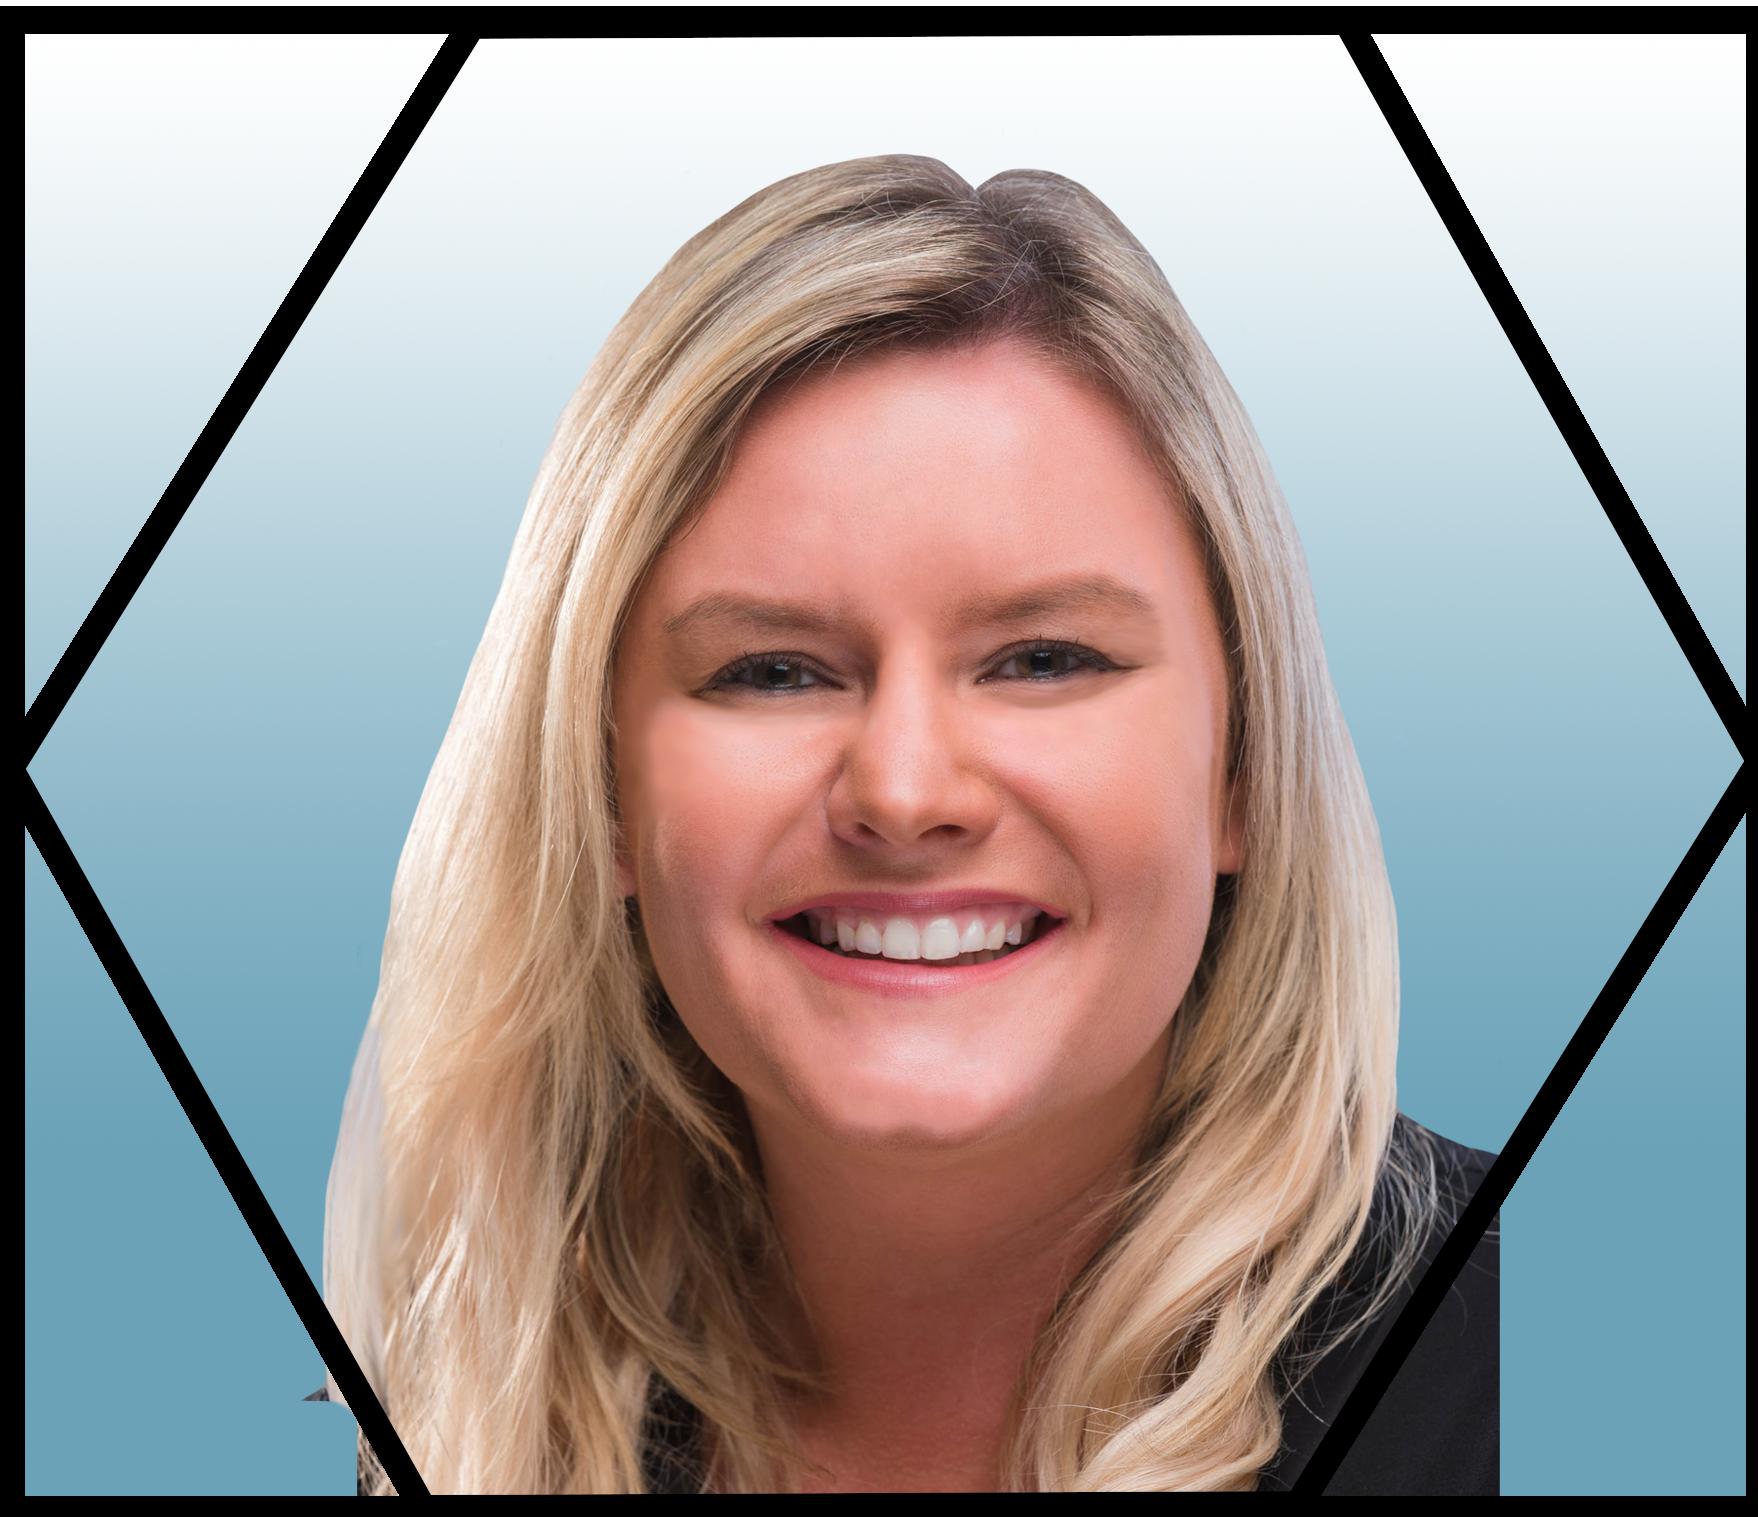 Amanda%20Raywood,%20Human%20Resources Leadership Team